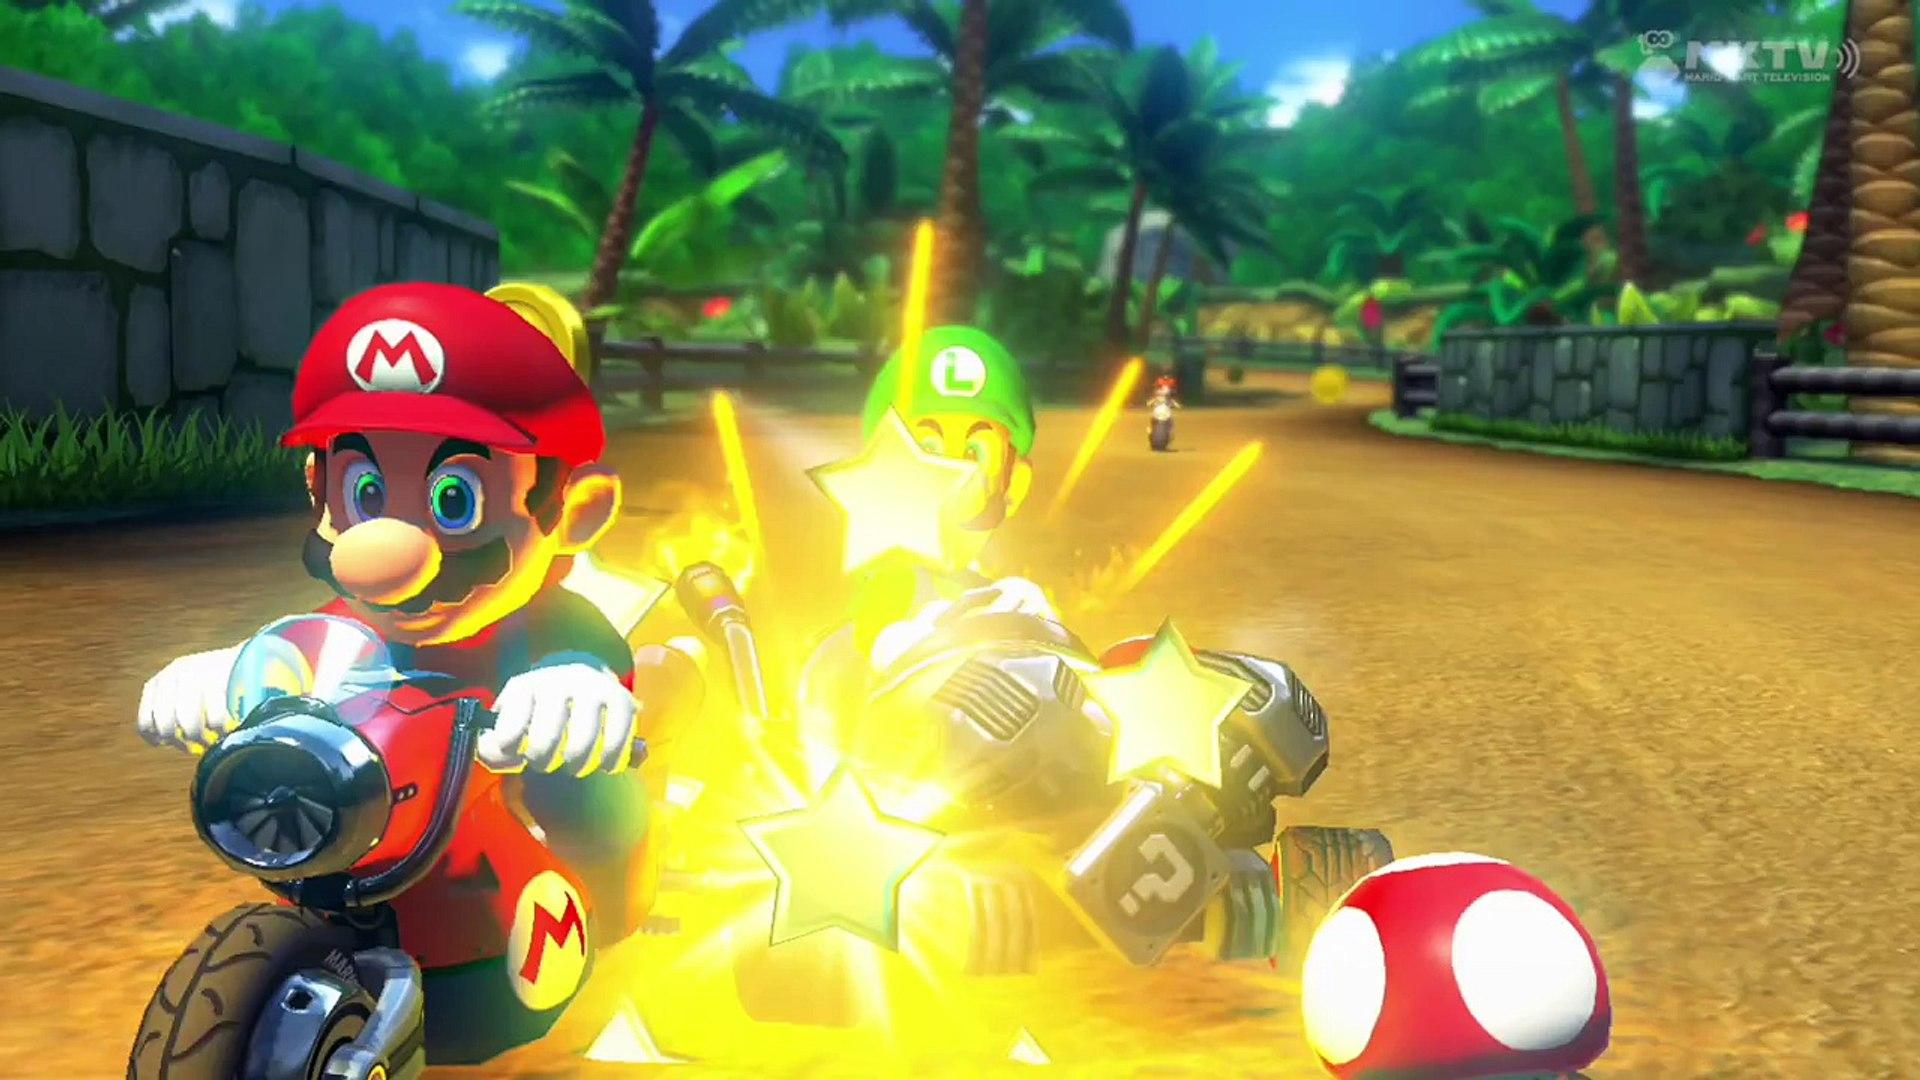 Luigi S Ridin Dirty Death Stare In Mario Kart 8 1080p60